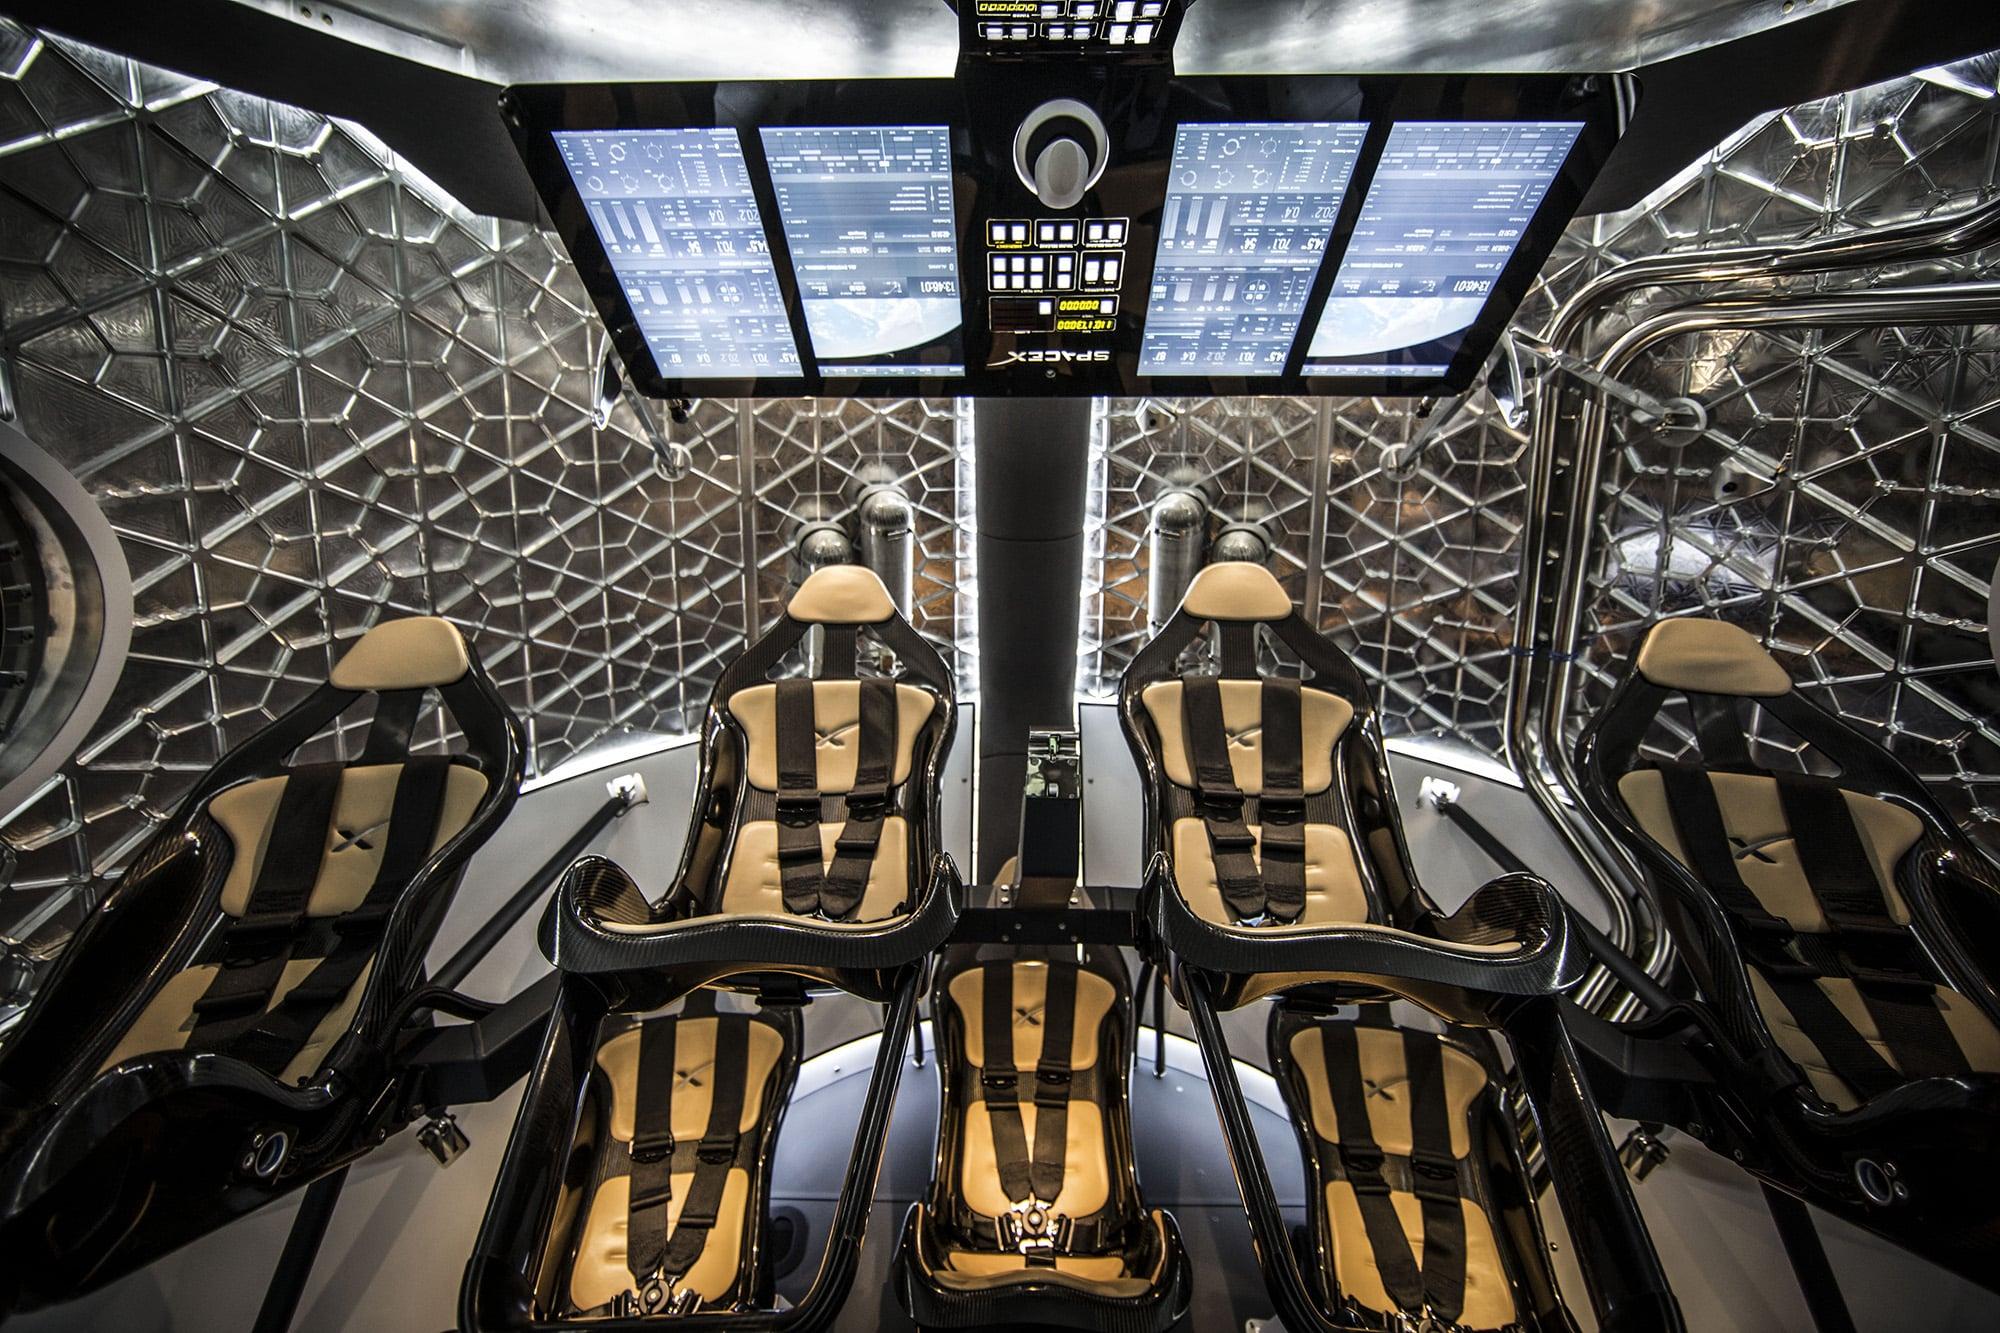 Dragon V2 naprednija je verzija bespilotnog broda Dragon (Credit: SpaceX)